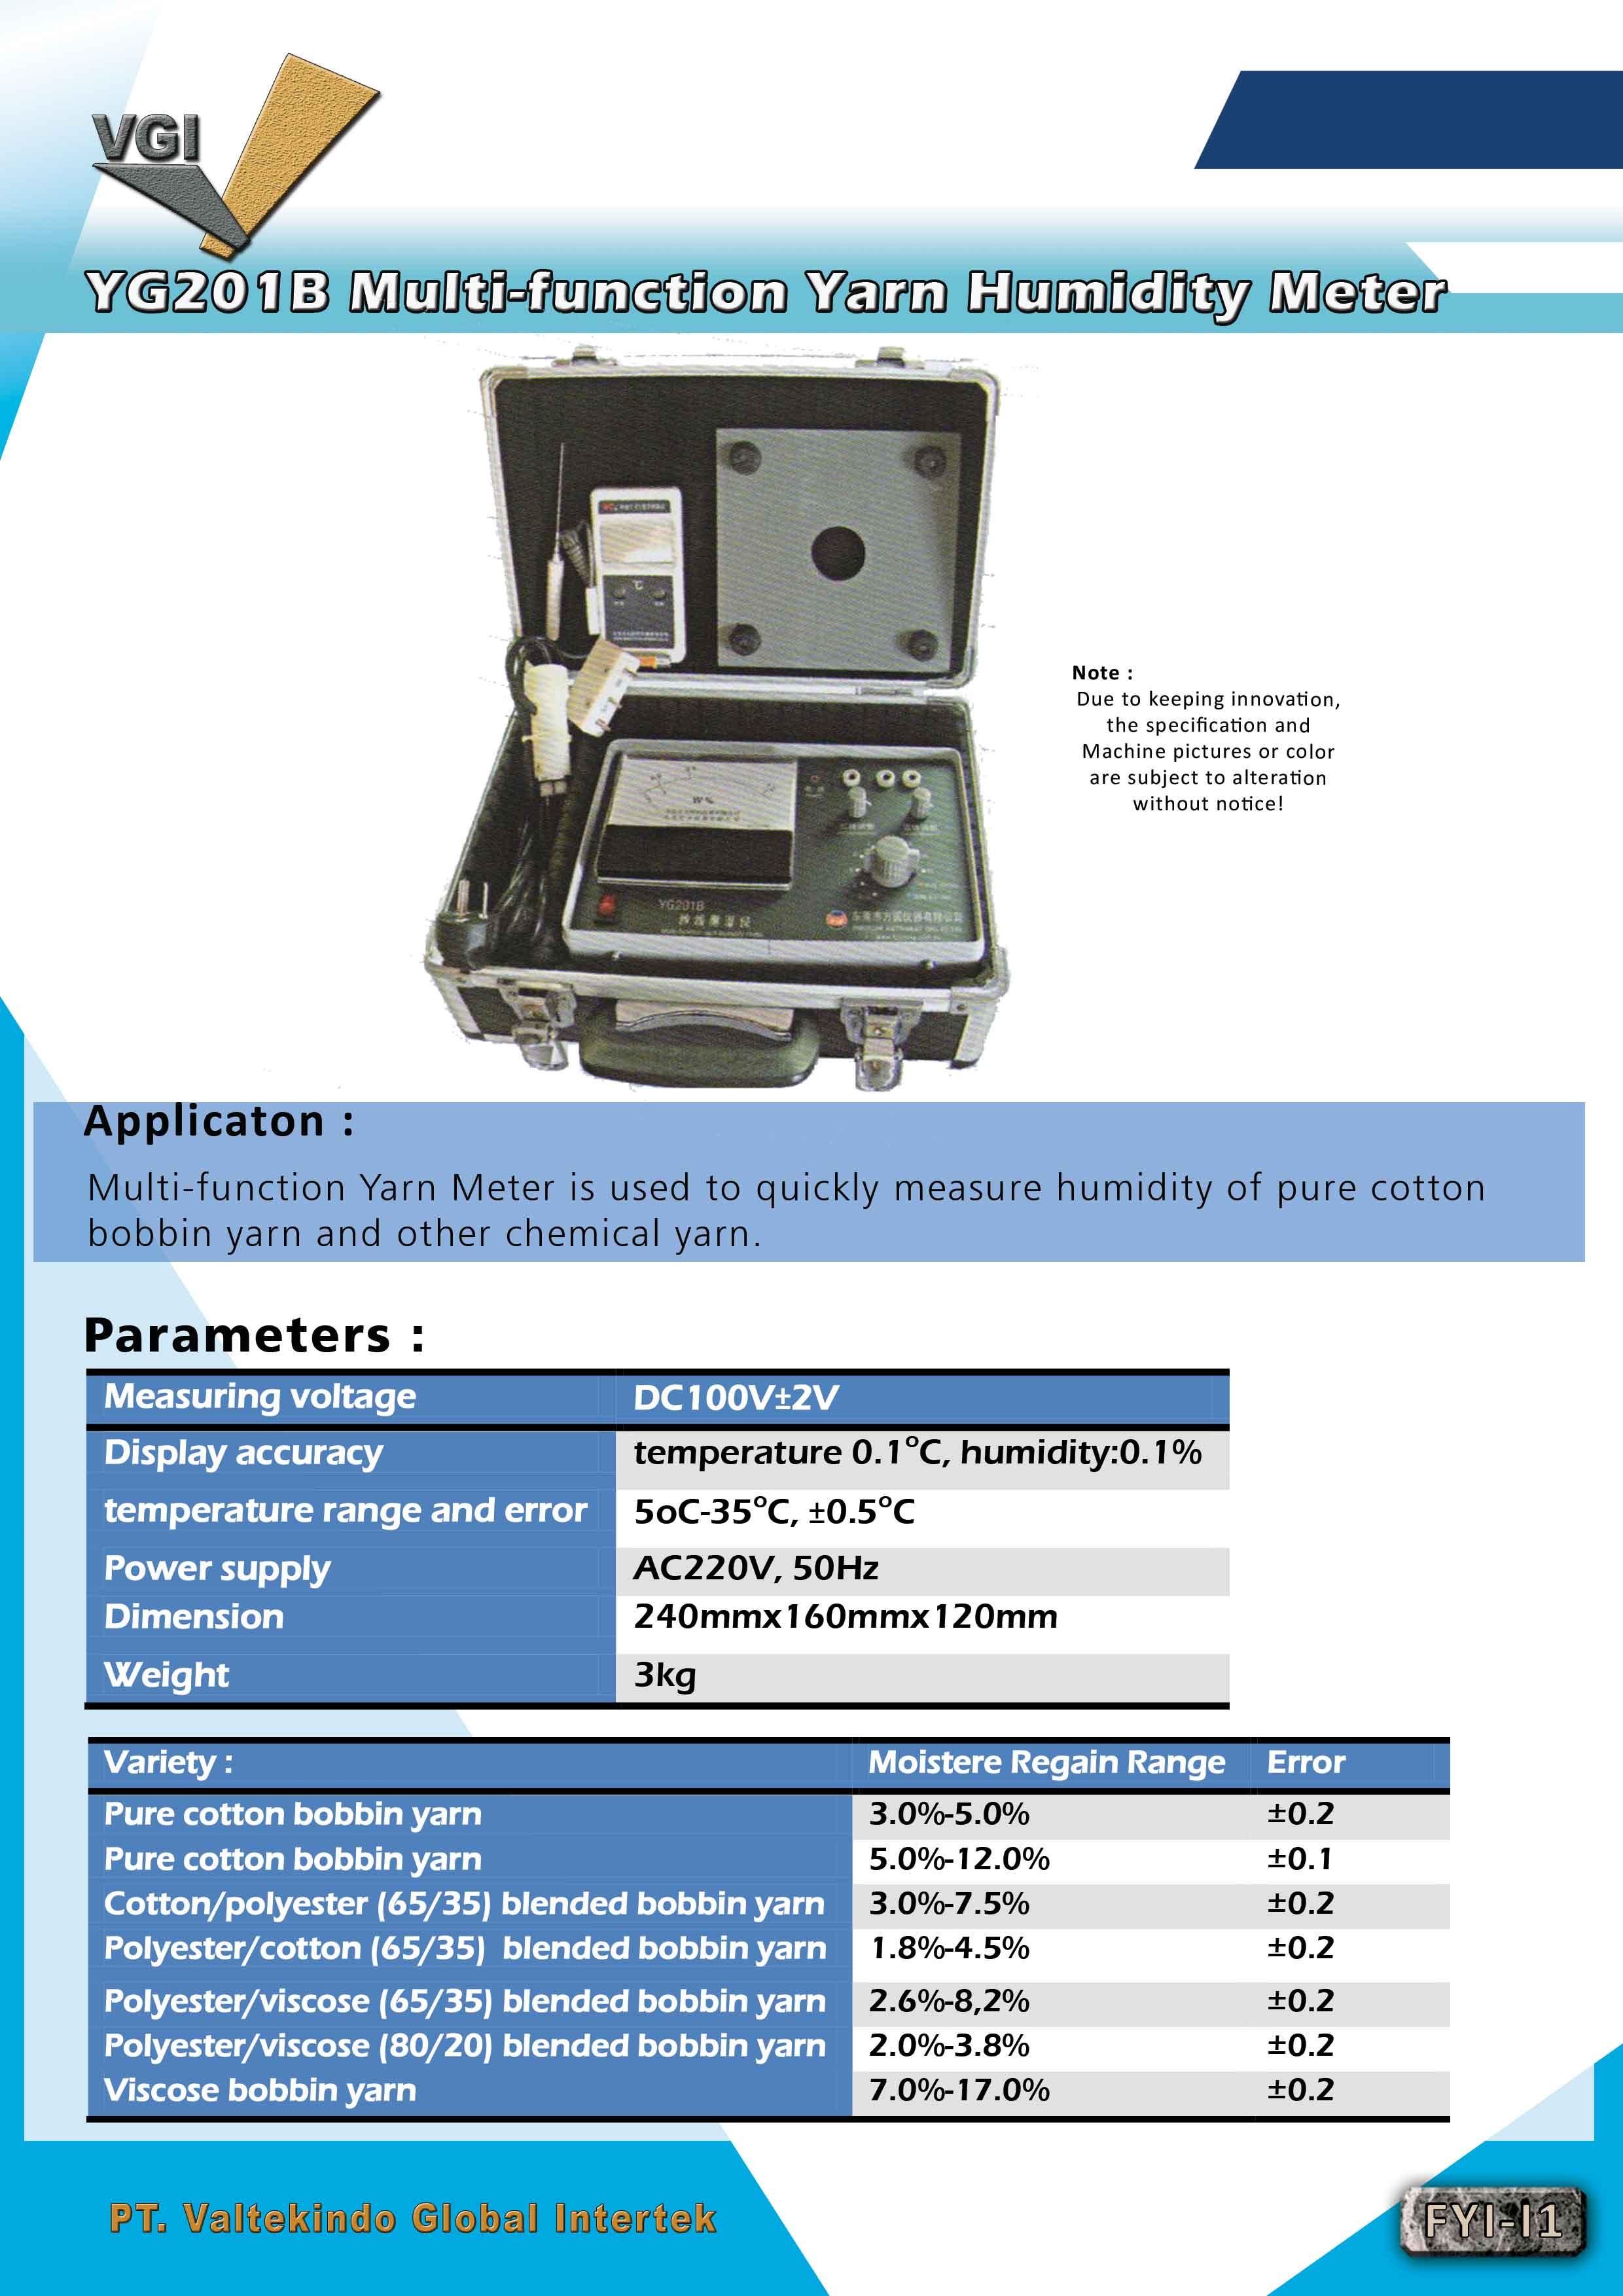 jual mesin Multi-Function Yarn Humidity Meter Multi-Function Yarn Humidity Meter